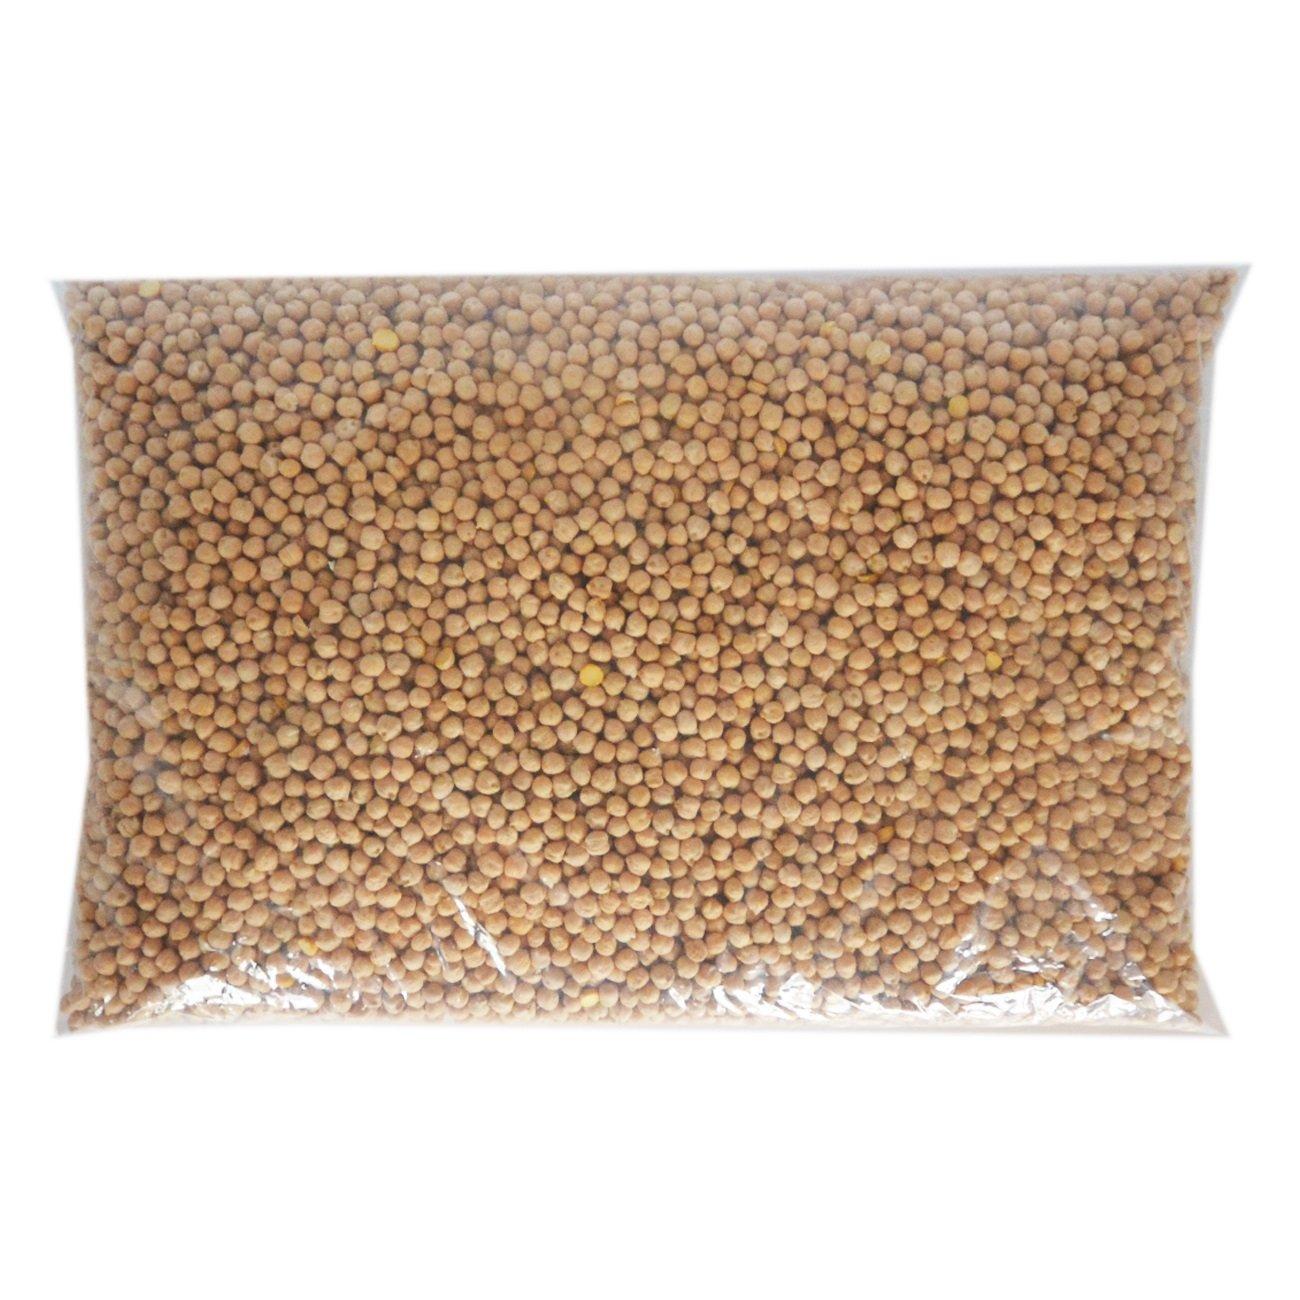 Classic Provisions Garbanzo Beans, 10 Pound